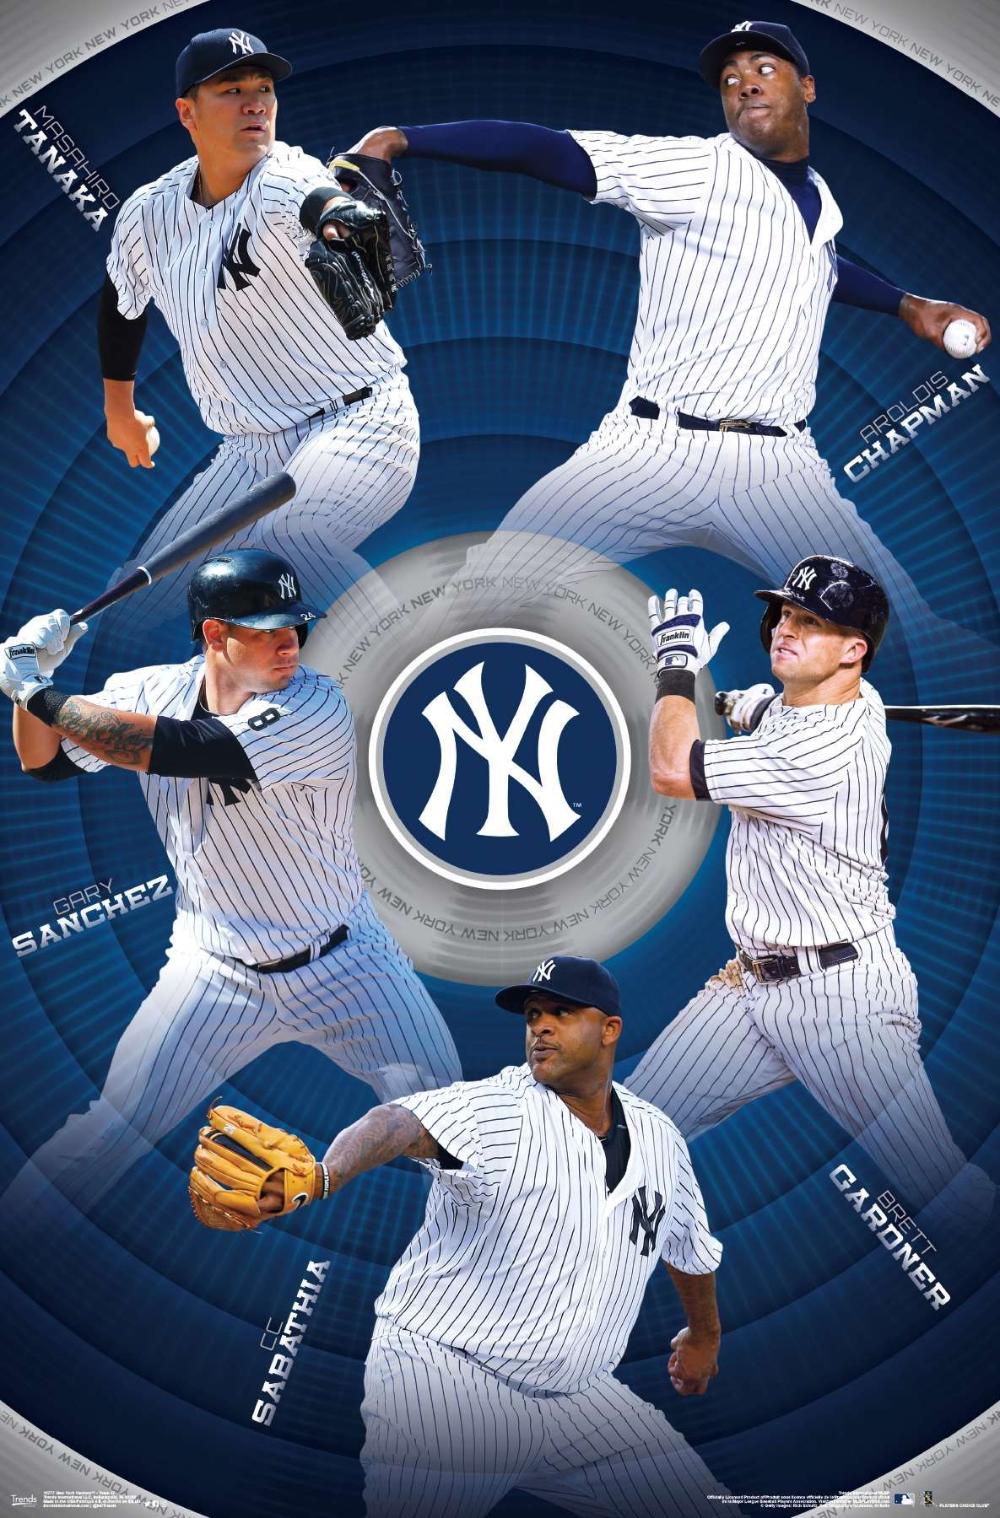 Mlb New York Yankees Team In 2020 New York Yankees Yankees Team Yankees